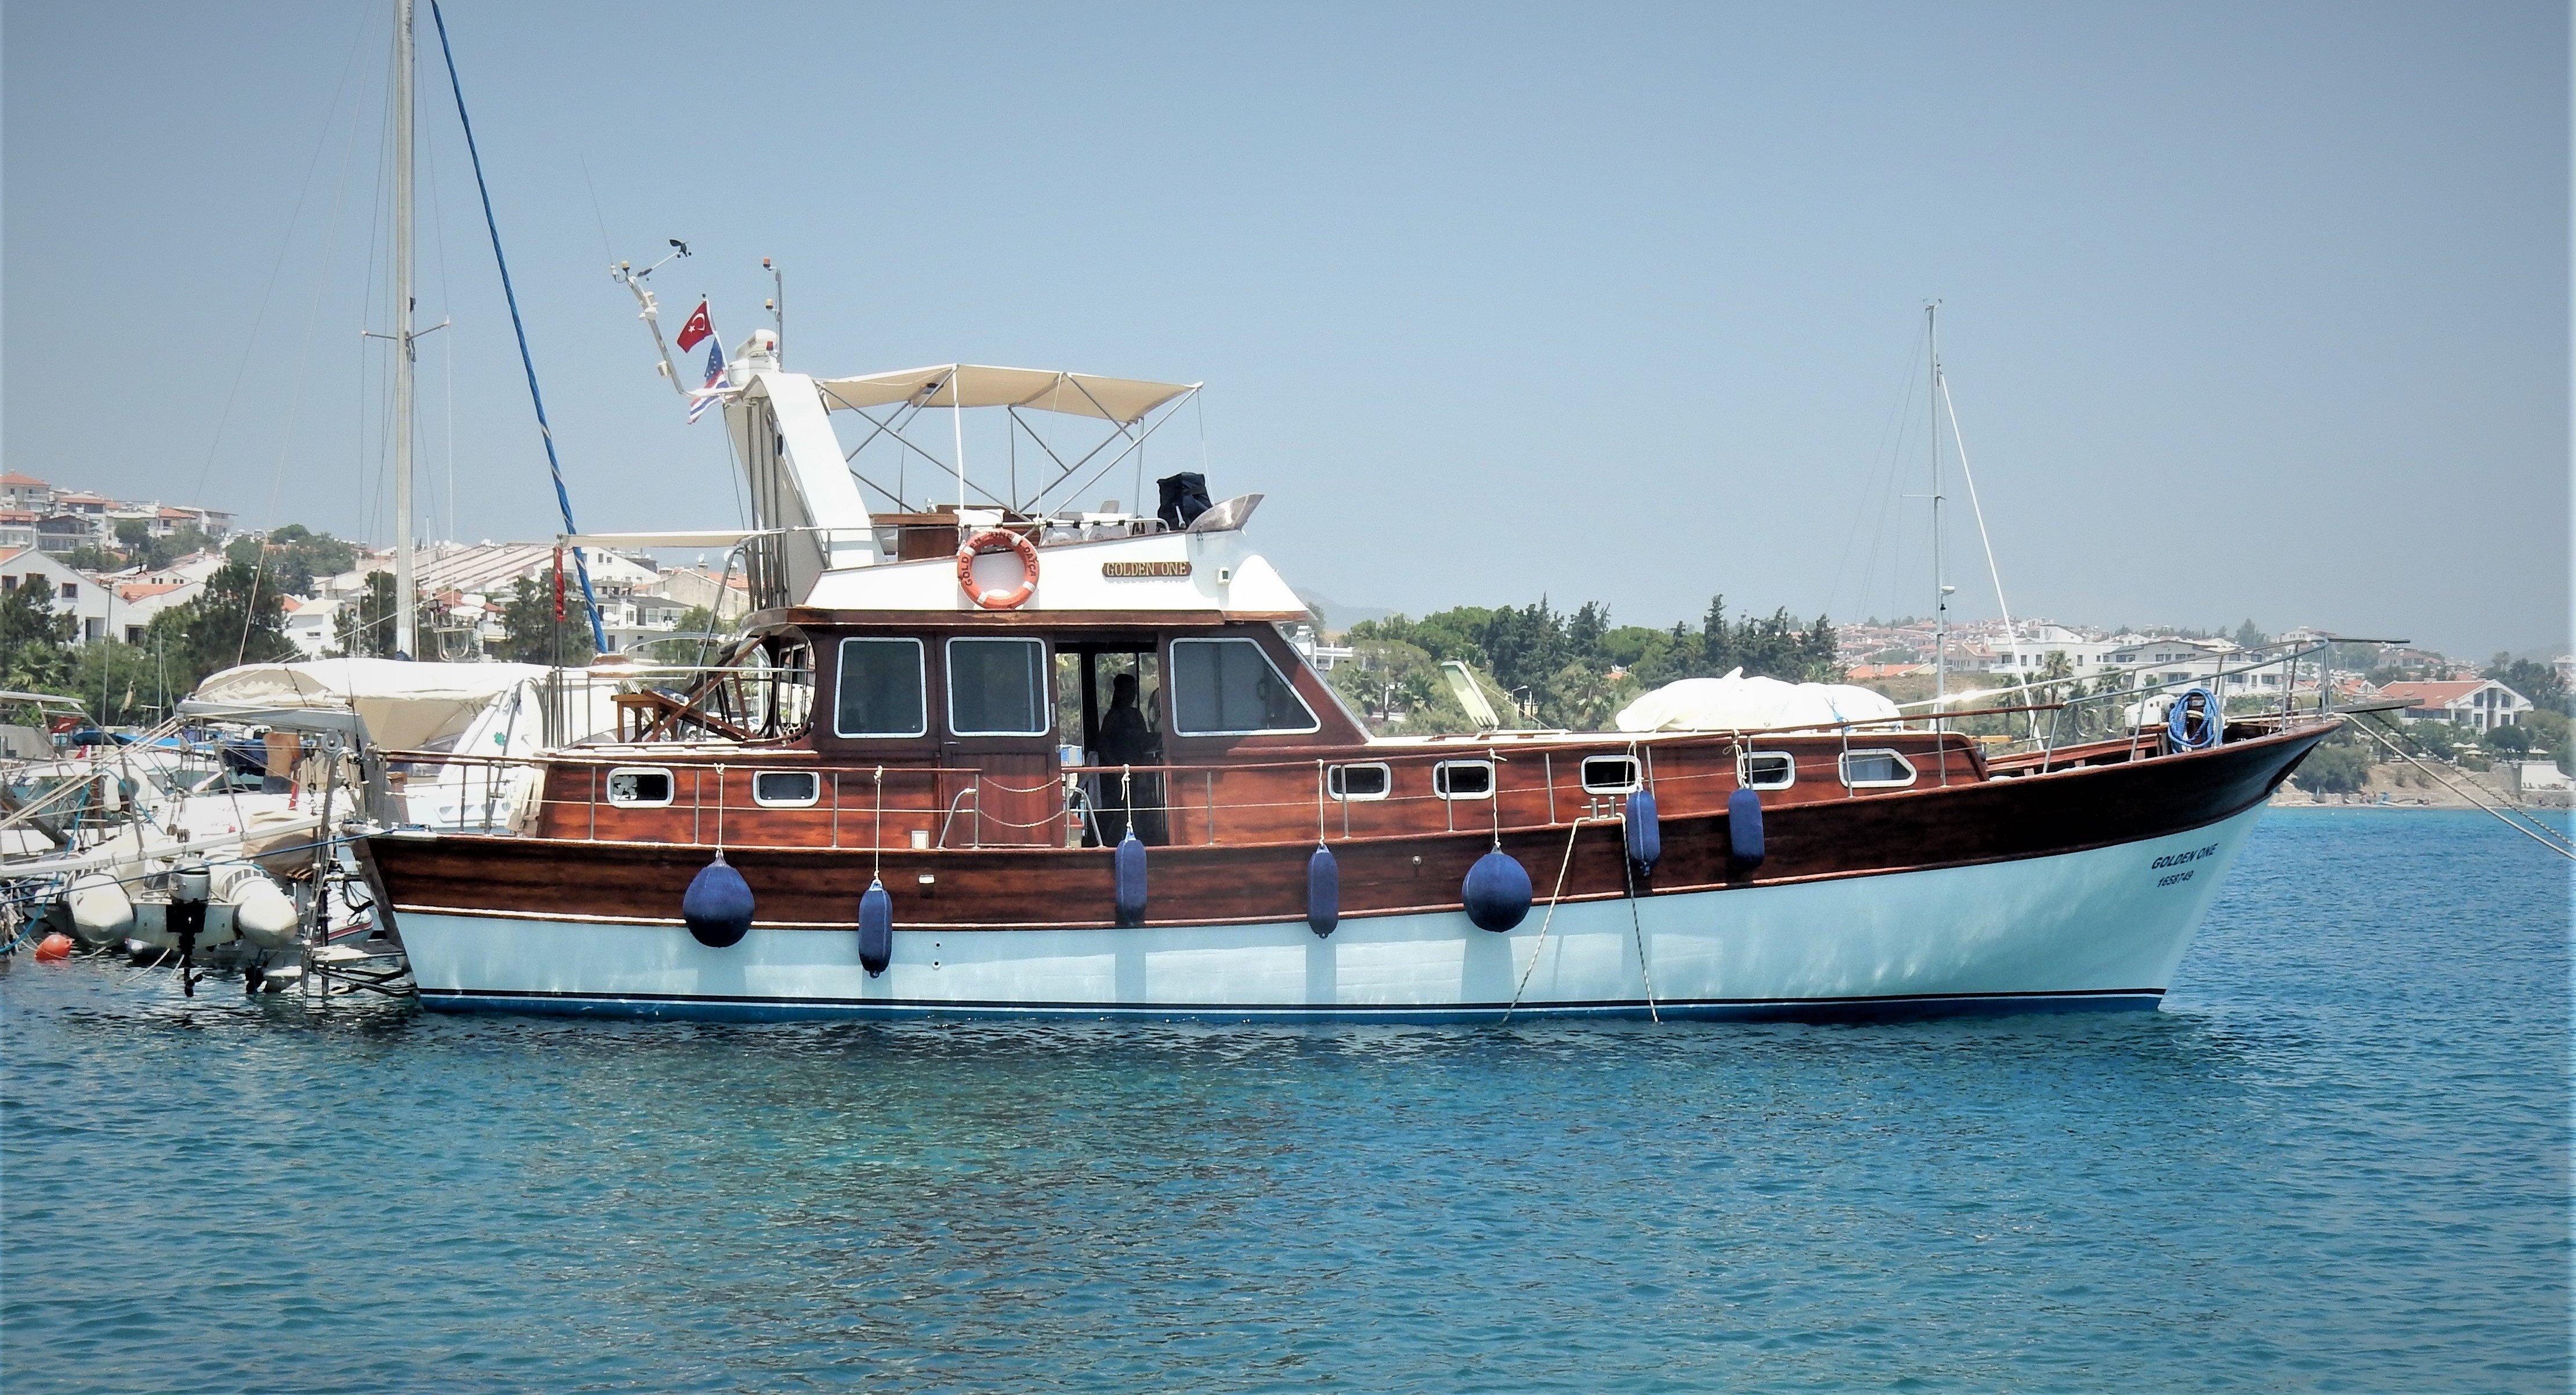 Majoni cruise boat